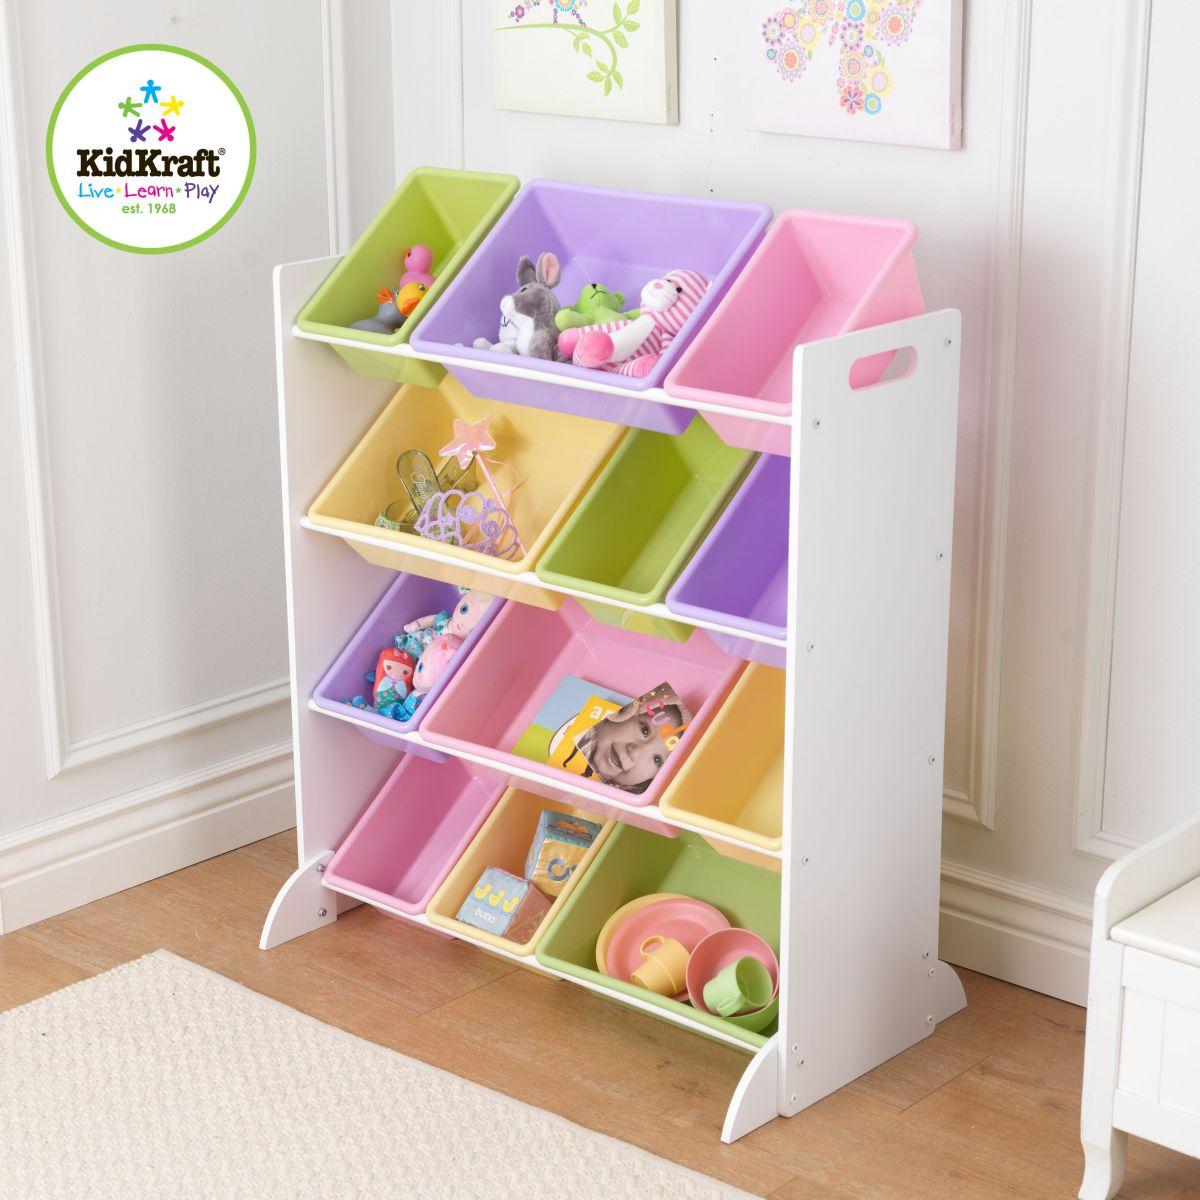 Kidkraft meuble avec bacs de rangement pastel 15450 for Meuble de rangement jouet